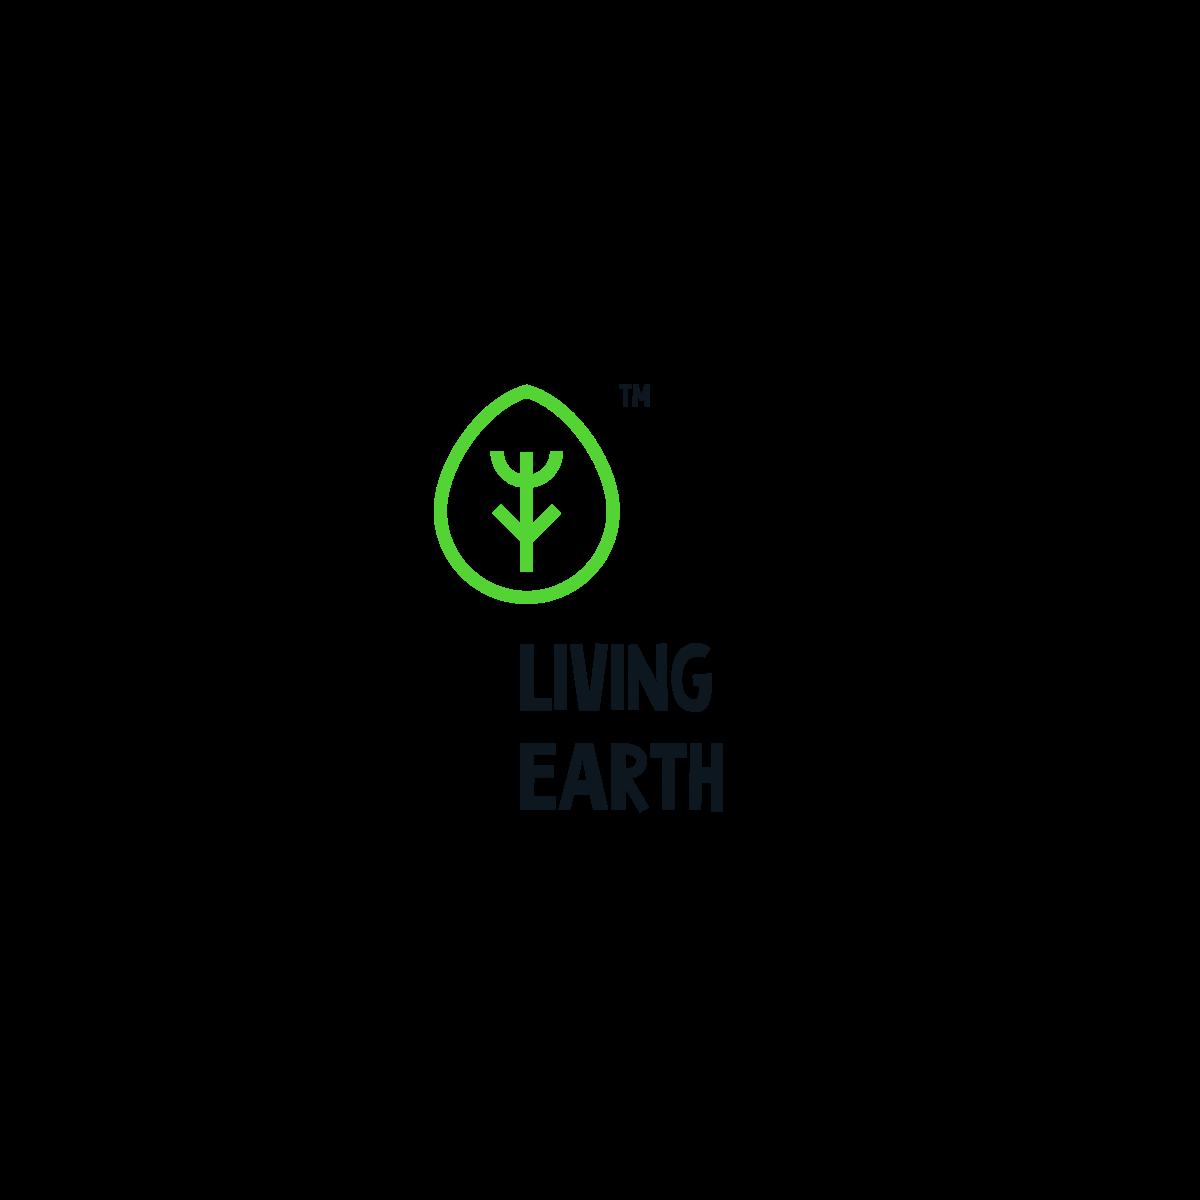 Living Earth Logo - redesign